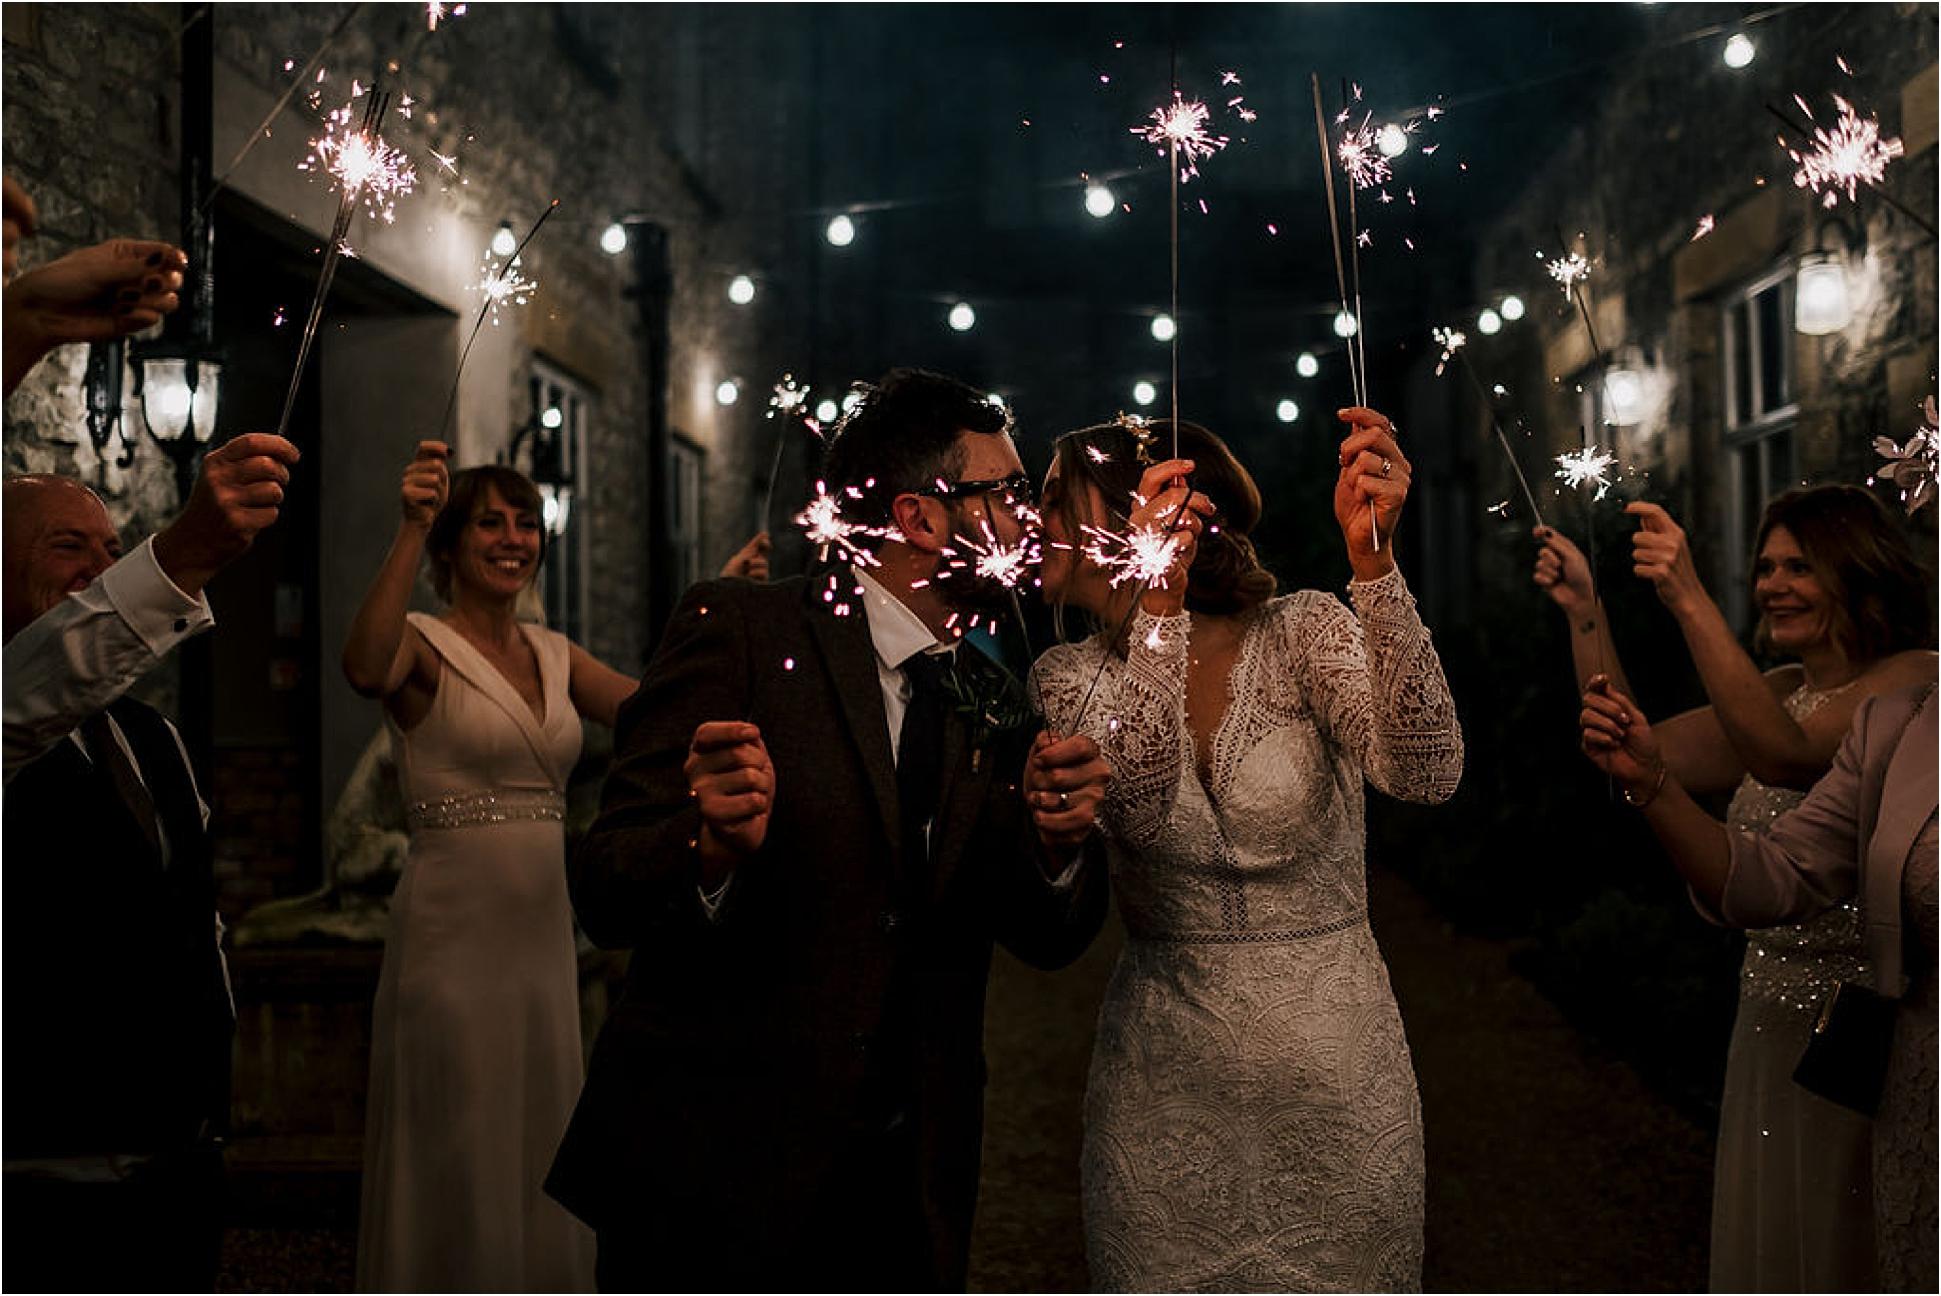 Iain + Jen's Winter Wedding at Holmes Mill